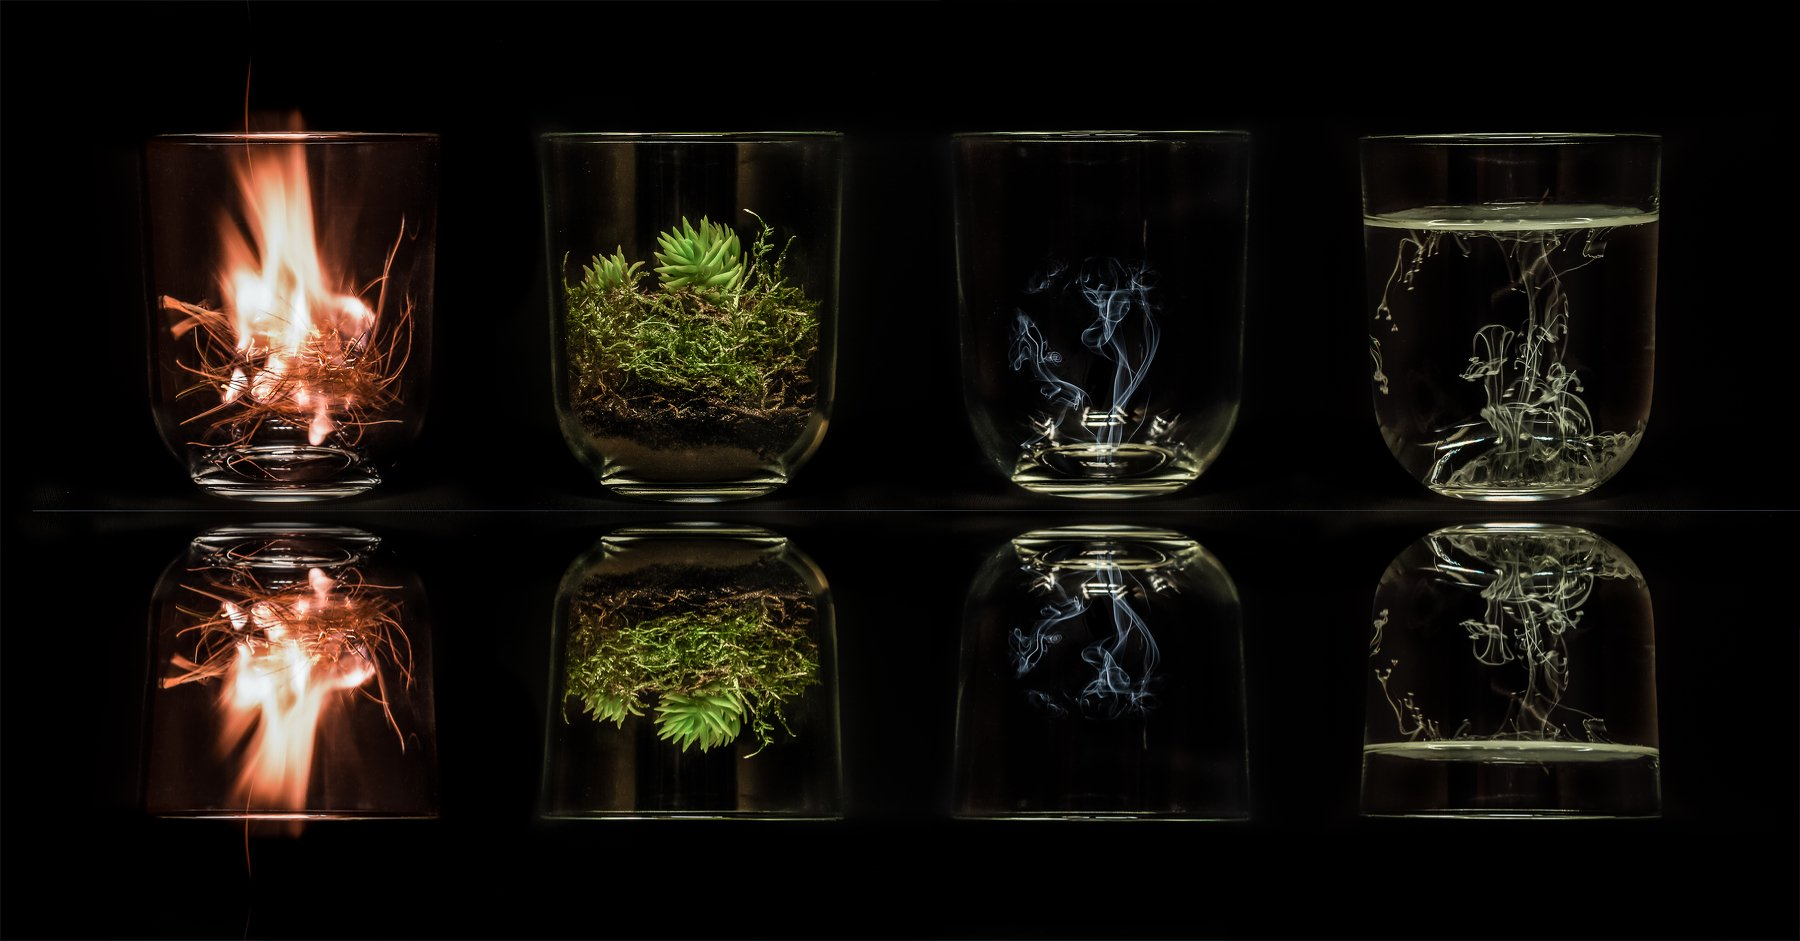 4 elements, concept, art, glass, 4 элемента, fire, hearth, water, air, abstract, art, 4, glass, black, reflections, 4 элементов, концепция, искусство, стекло, 4 элемента, огнь, очаг, вода, воздух, абстрактное, искусство, 4, стекло, черное, отражение, Antonio Bernardino